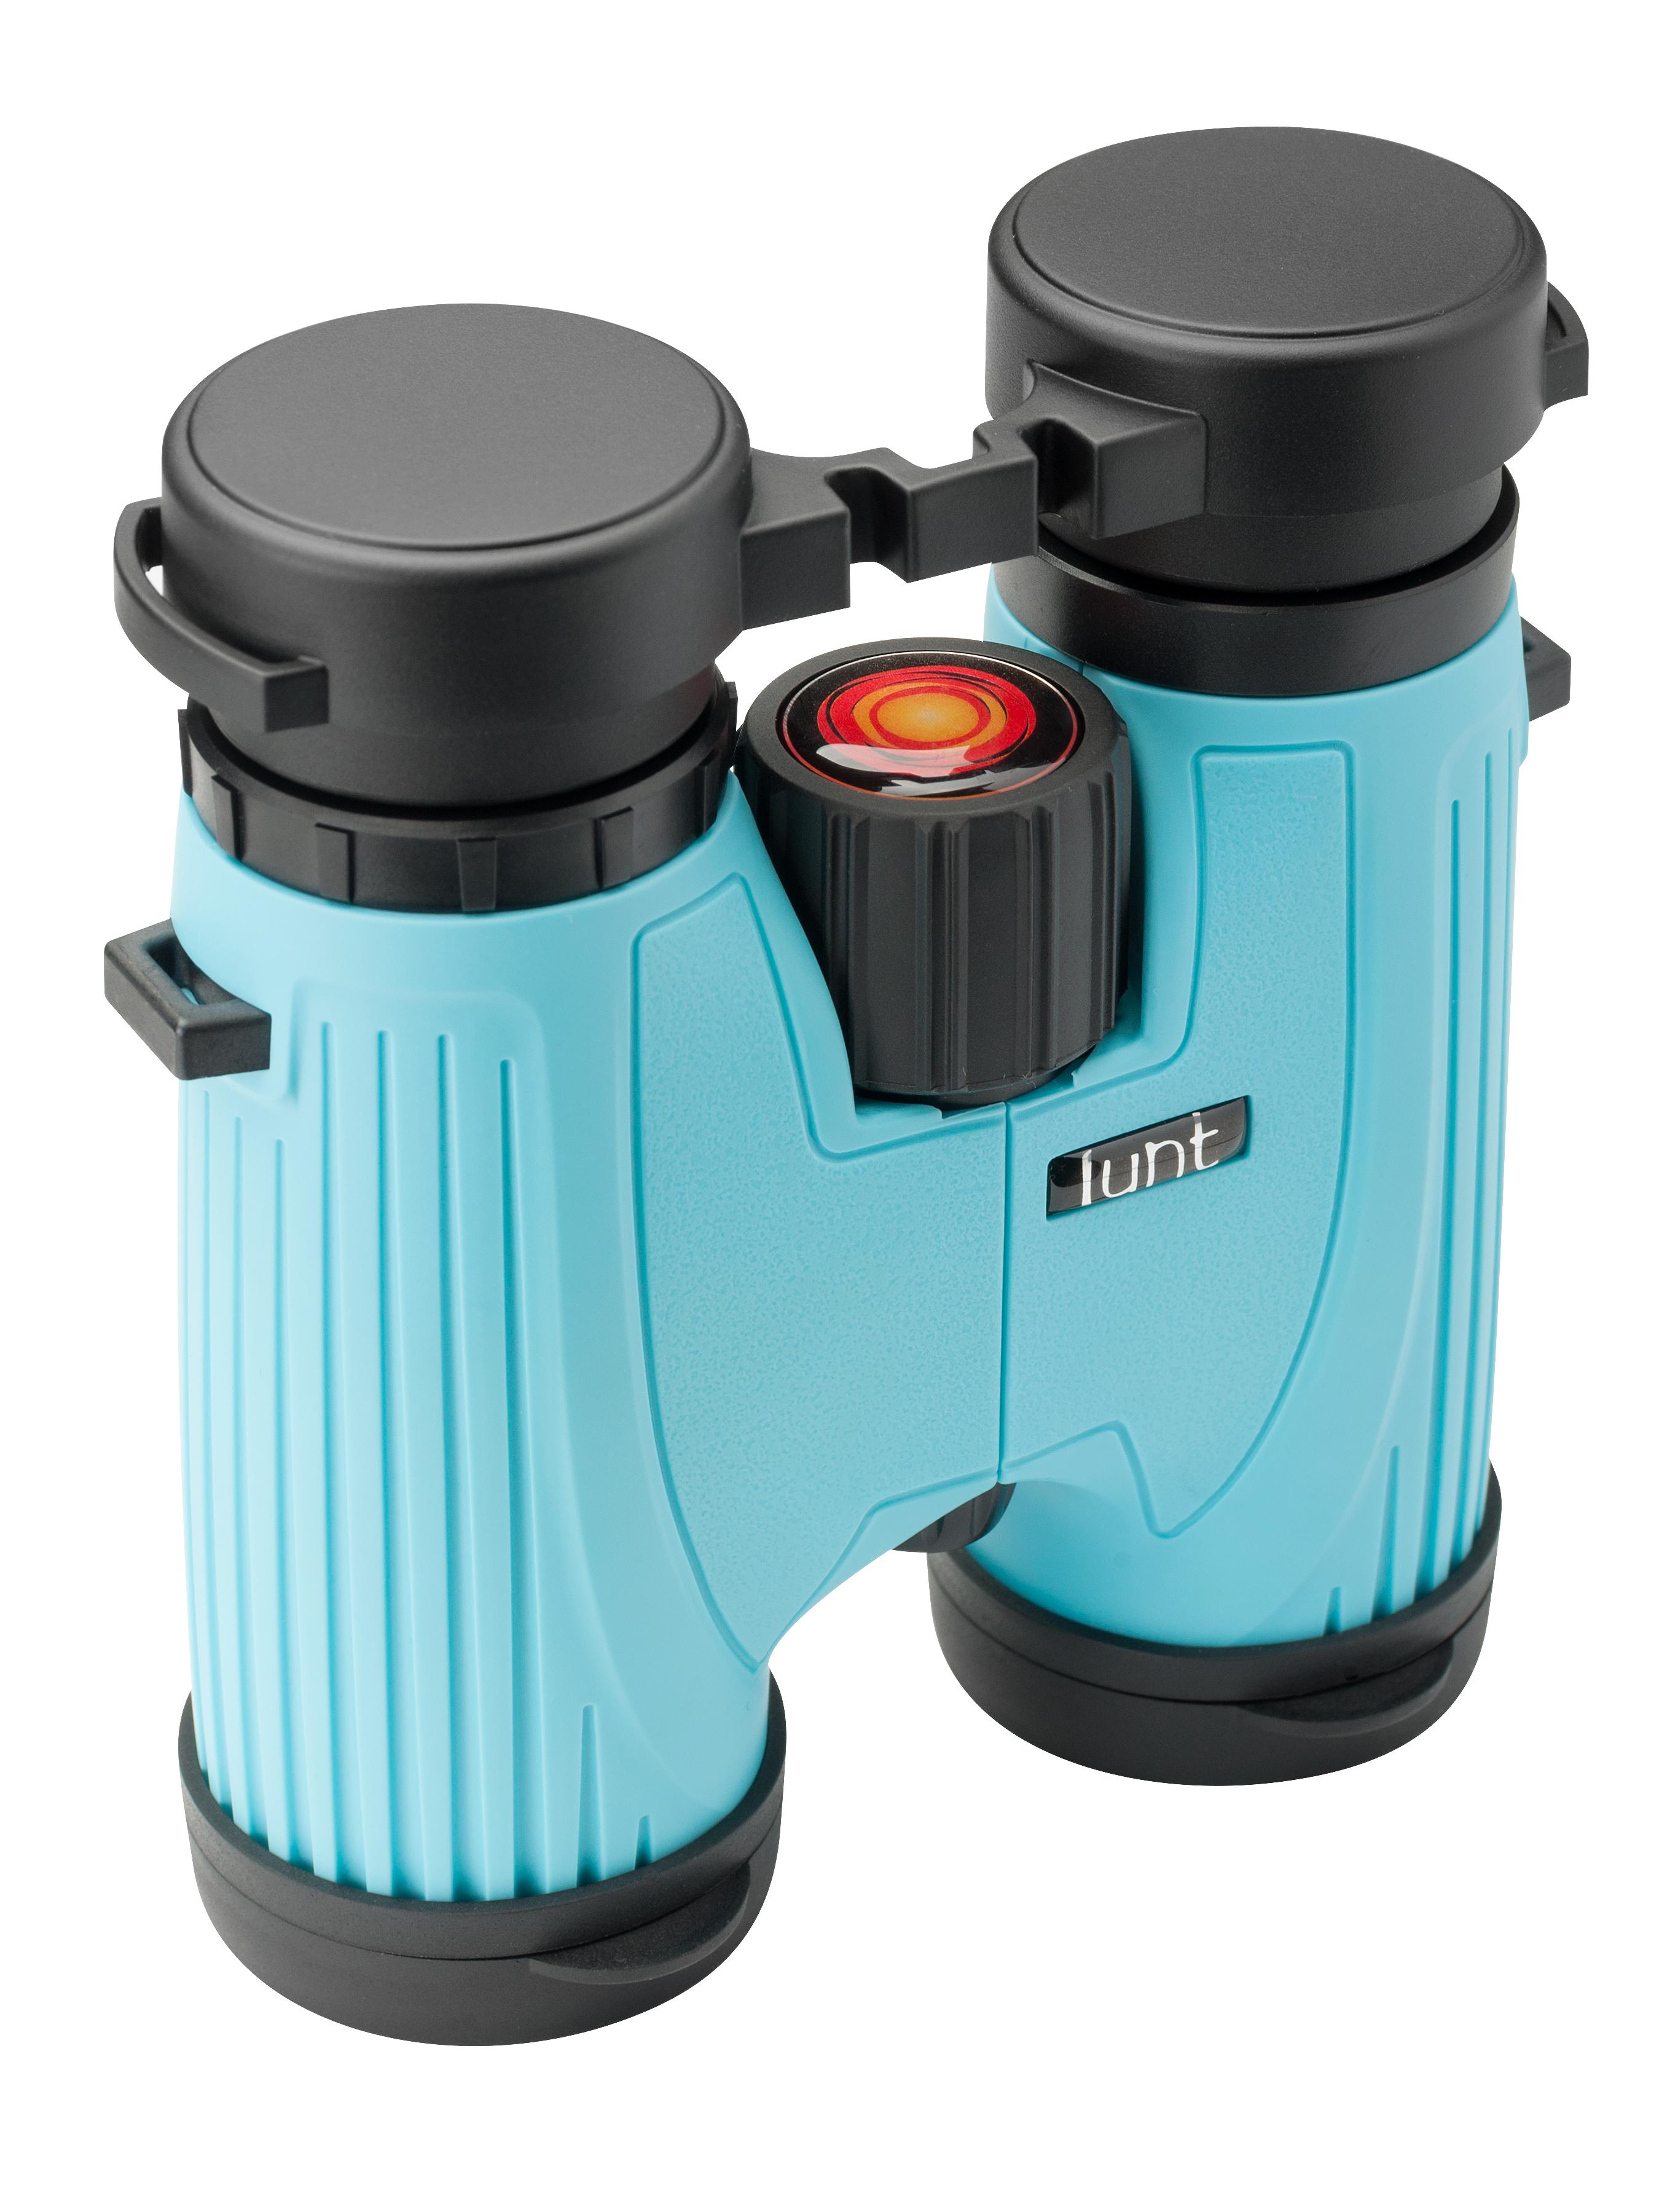 LUNT 8x32 White-Light SUNoculars (Blue)  5756c7857a77